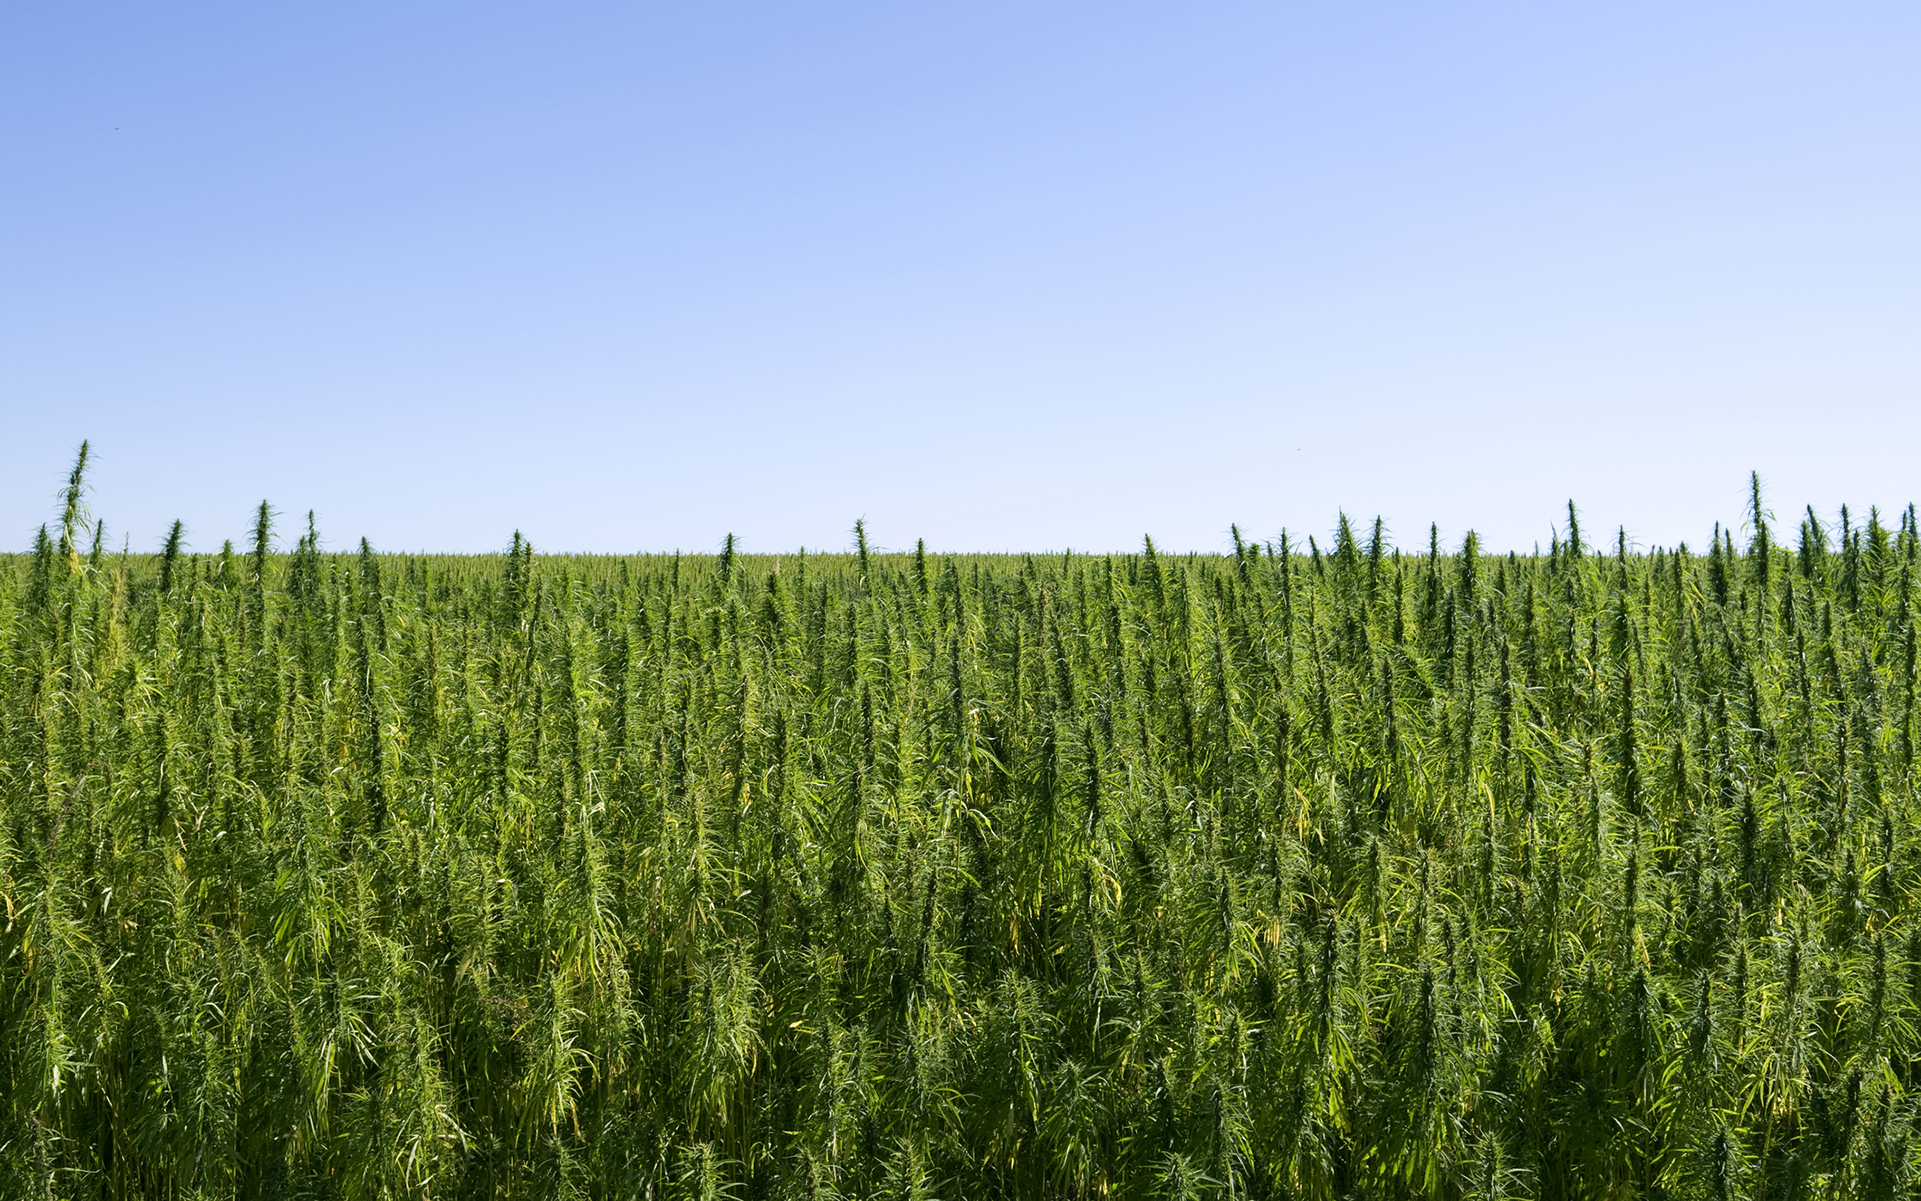 a field of non-psychoactive hemp plants